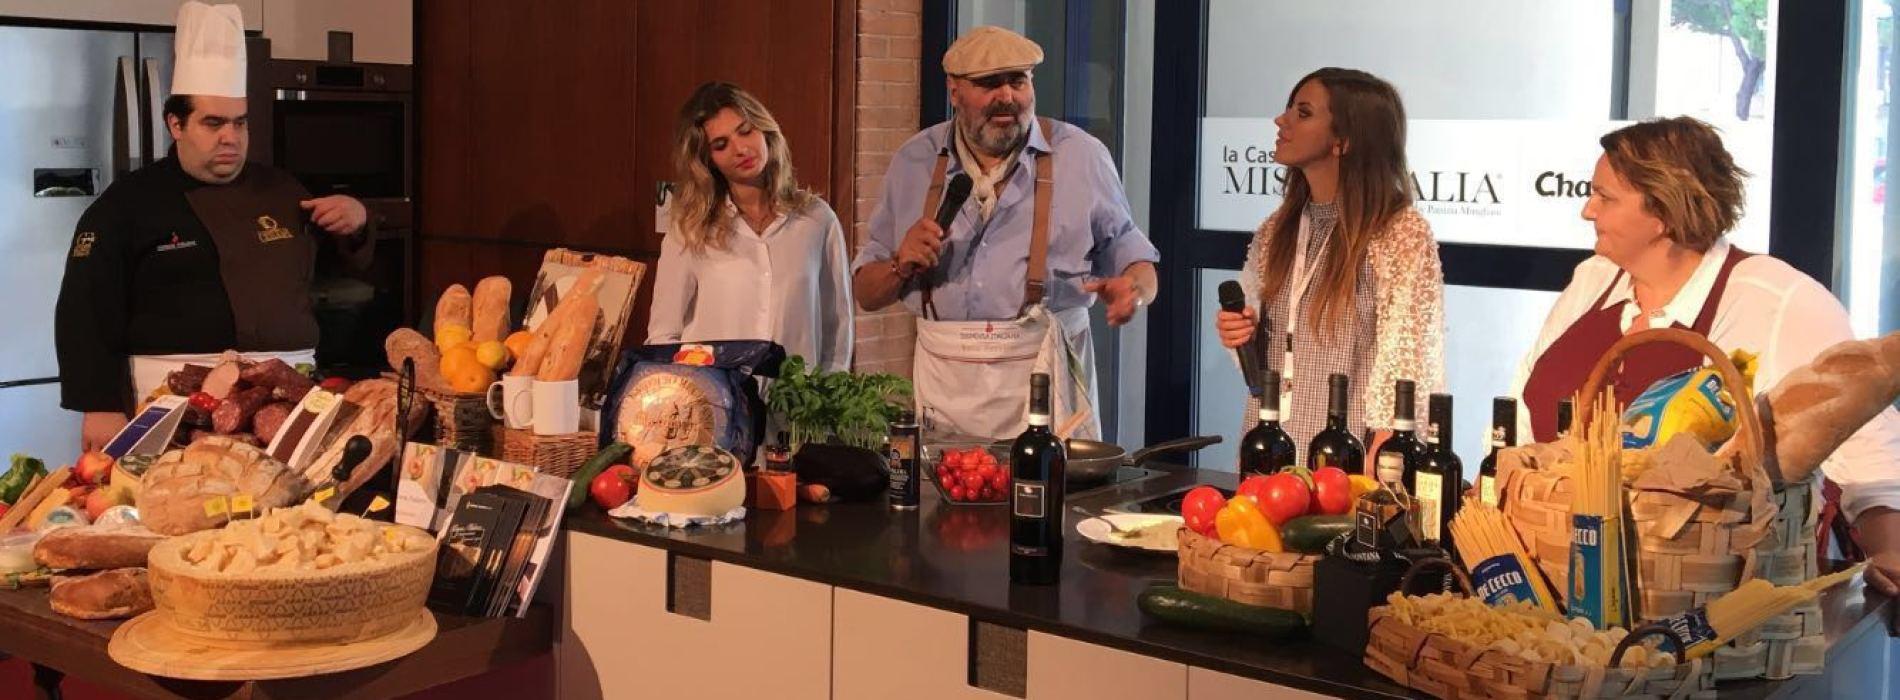 Tenuta Fontana a Jesolo. Cooking show con miss